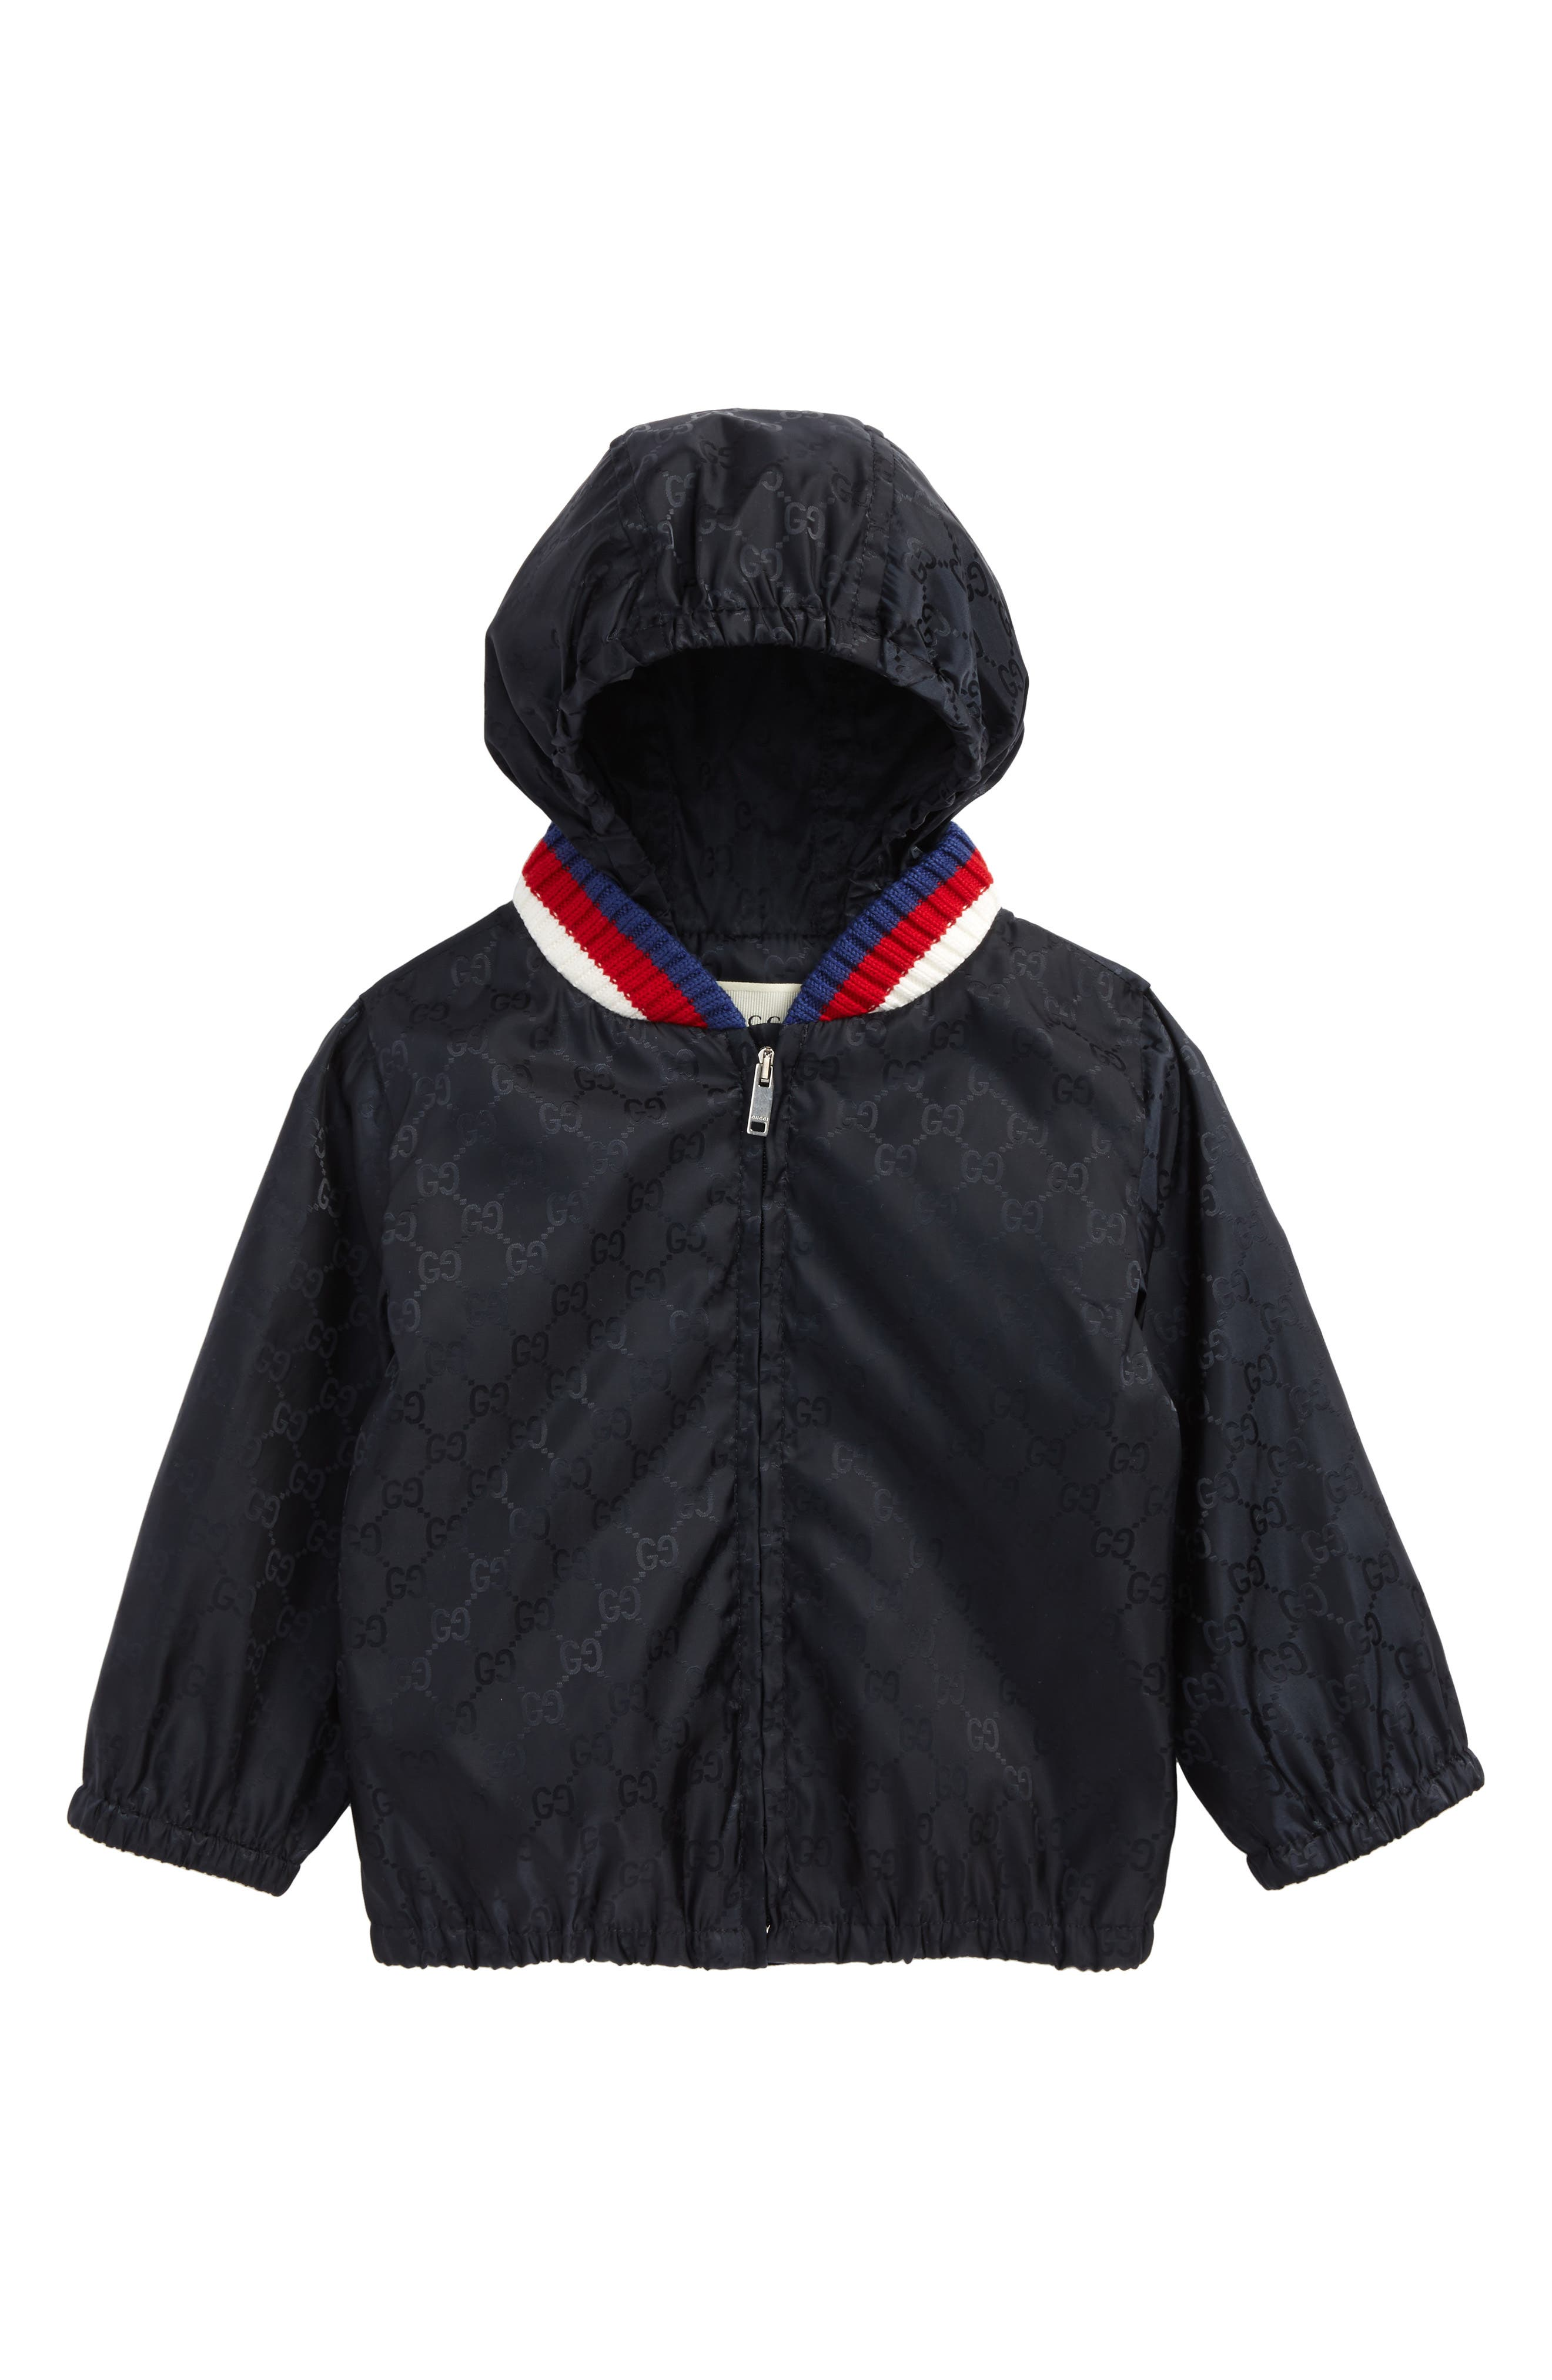 GUCCI, GG Logo Jacquard Hooded Rain Jacket, Main thumbnail 1, color, BLUE MULTI